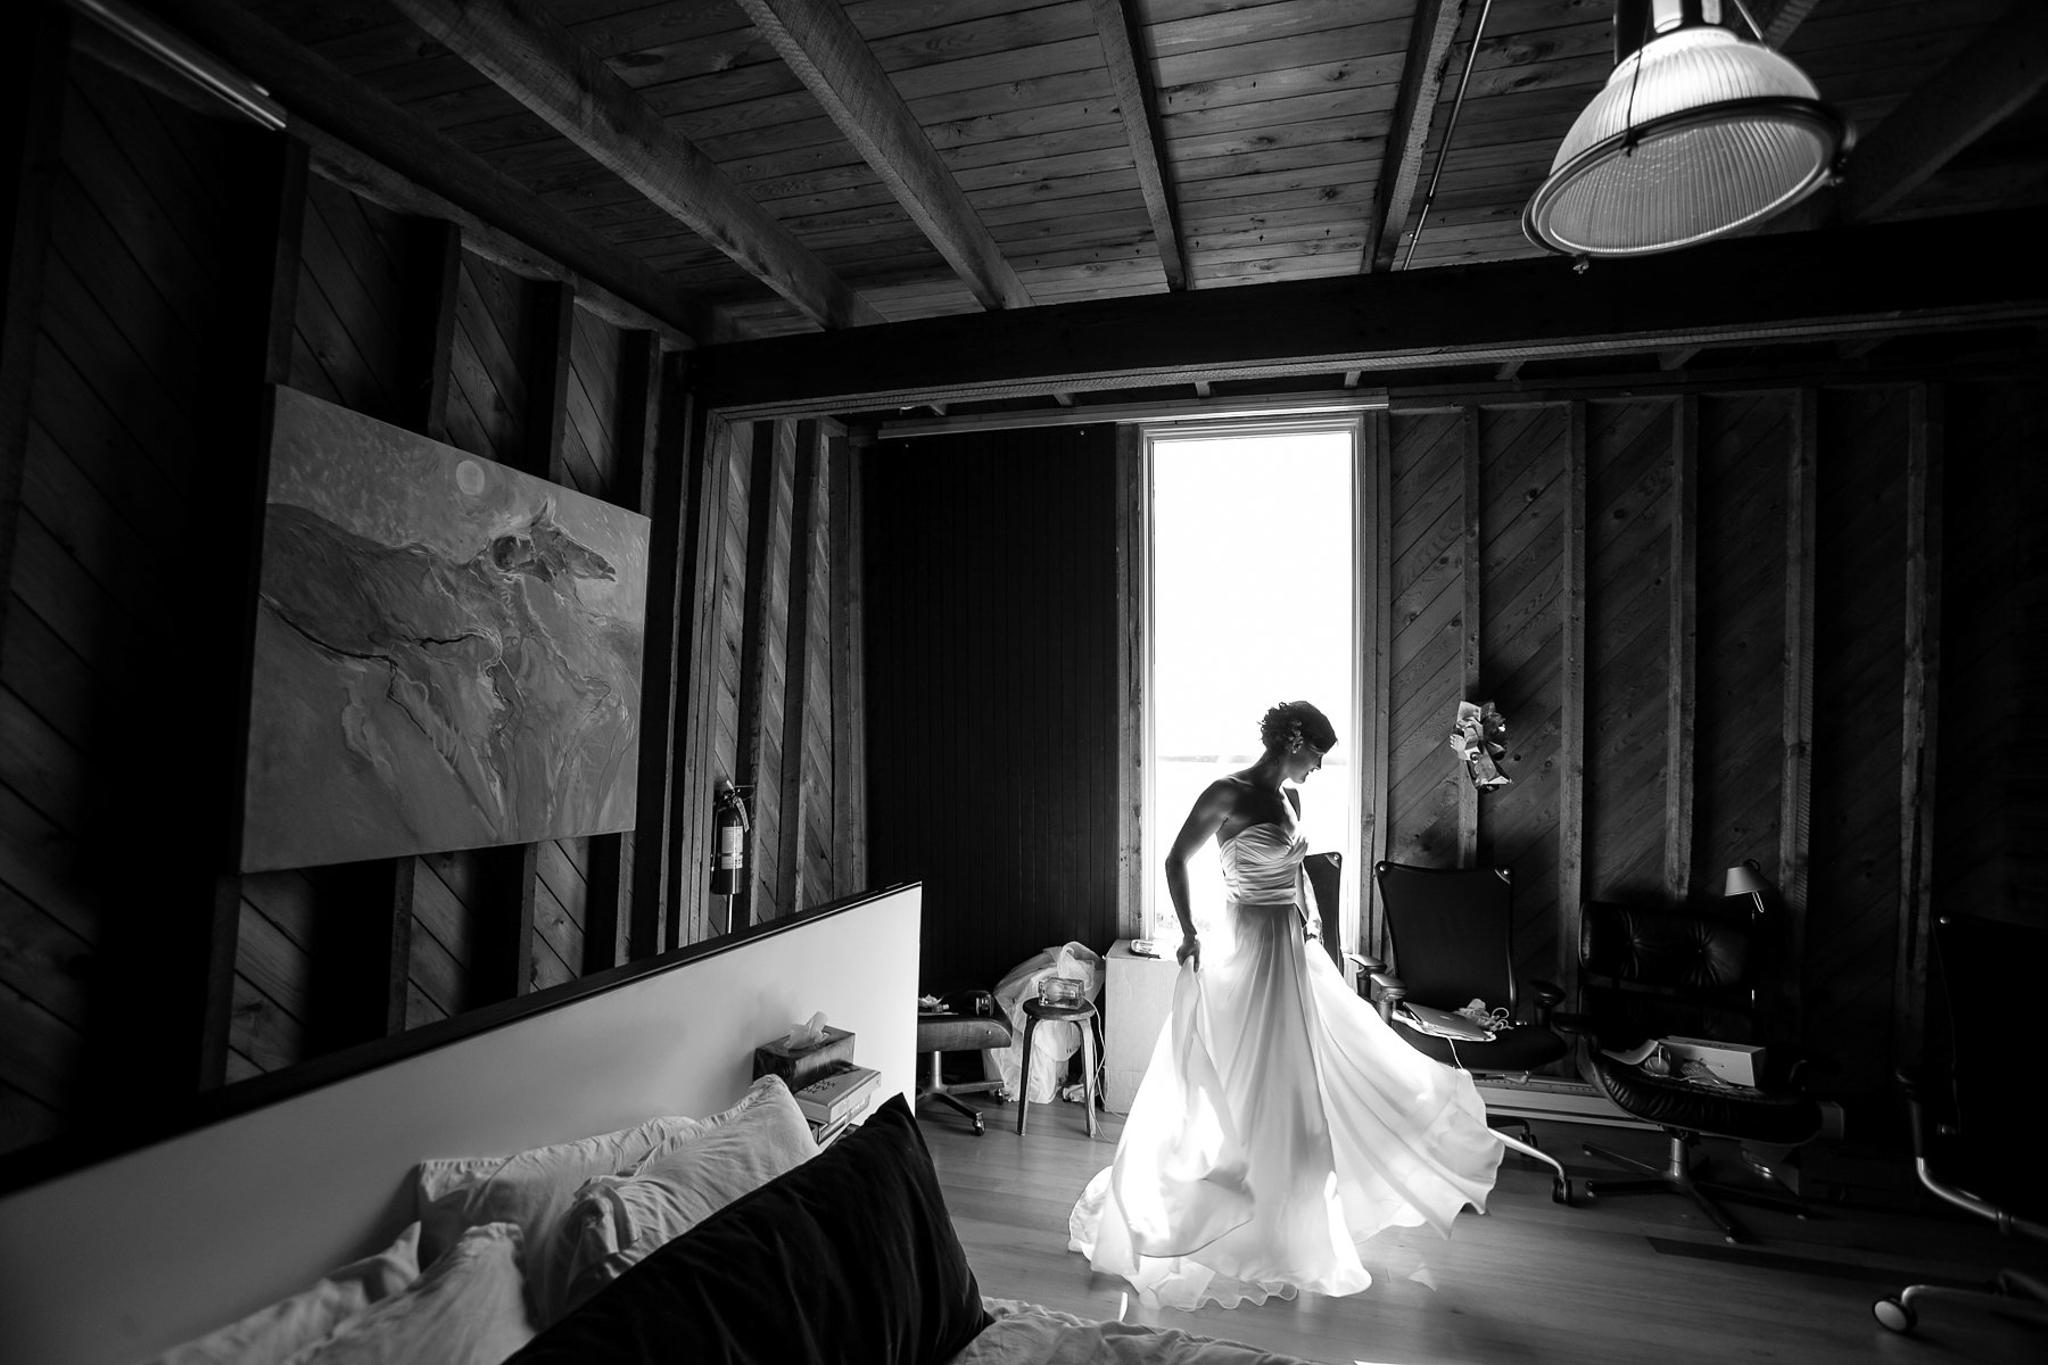 094-steph-mackinnon-WEDDING.jpg